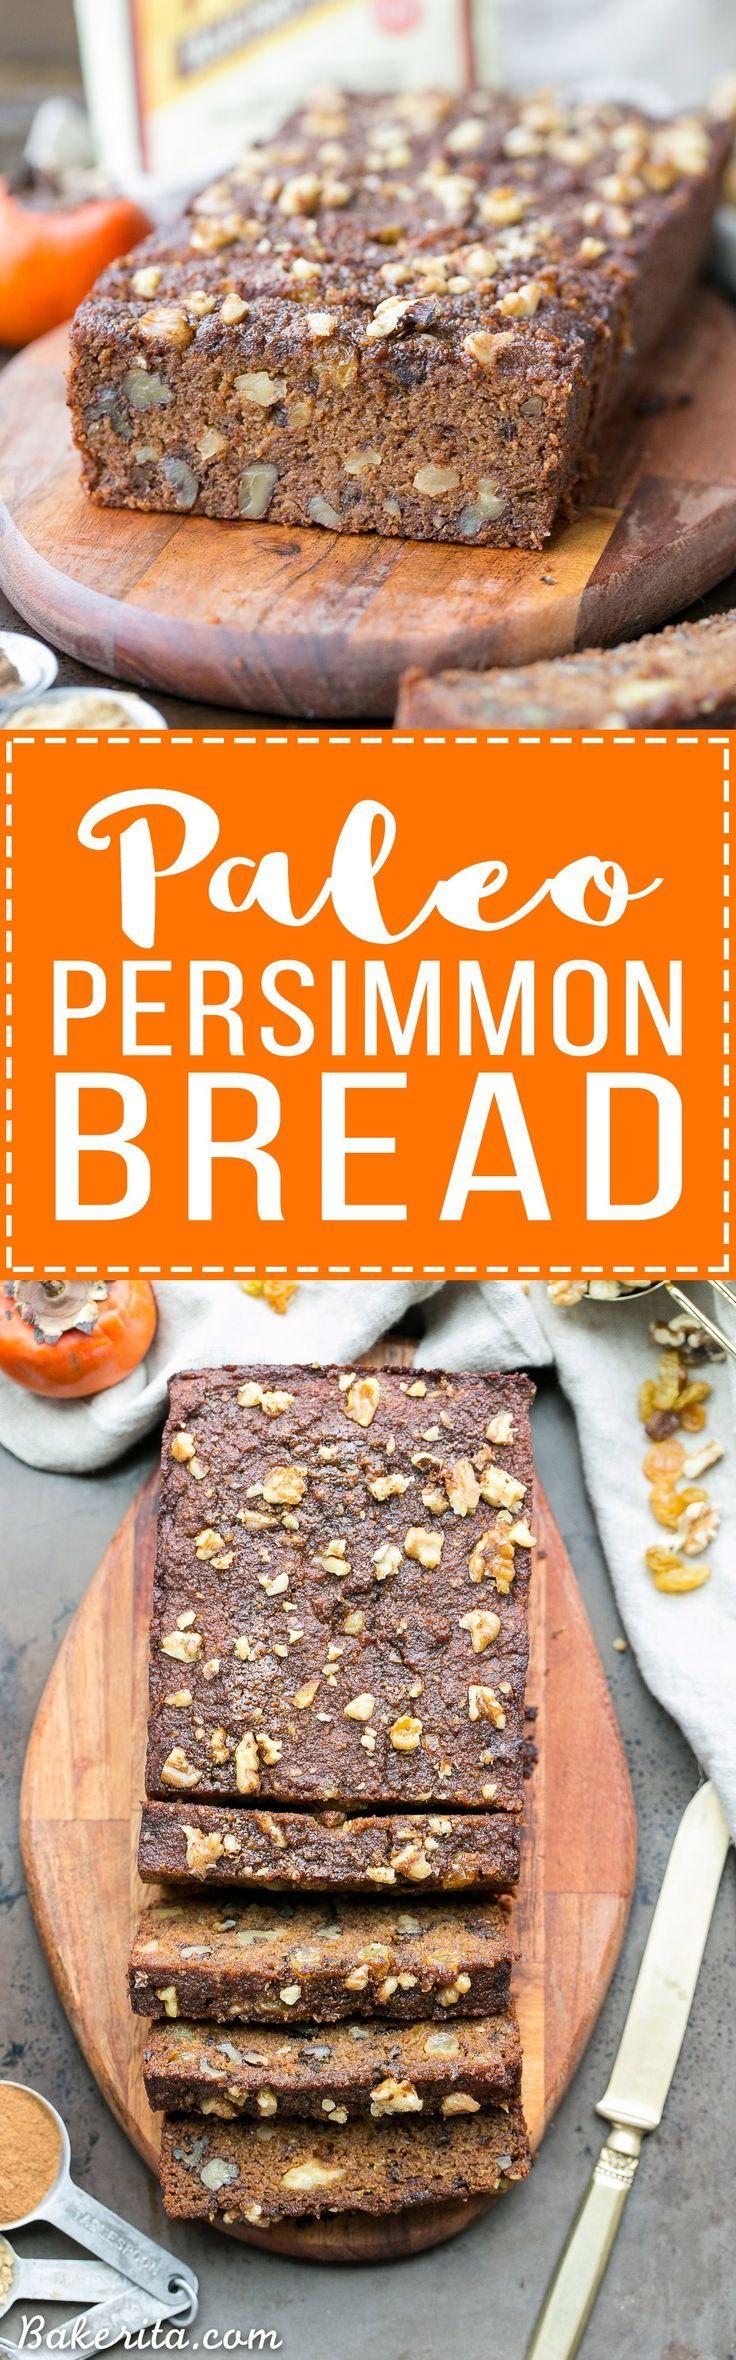 Paleo Persimmon Bread Bakerita Recipe Persimmon Bread Yummy Food Dessert Paleo Dessert